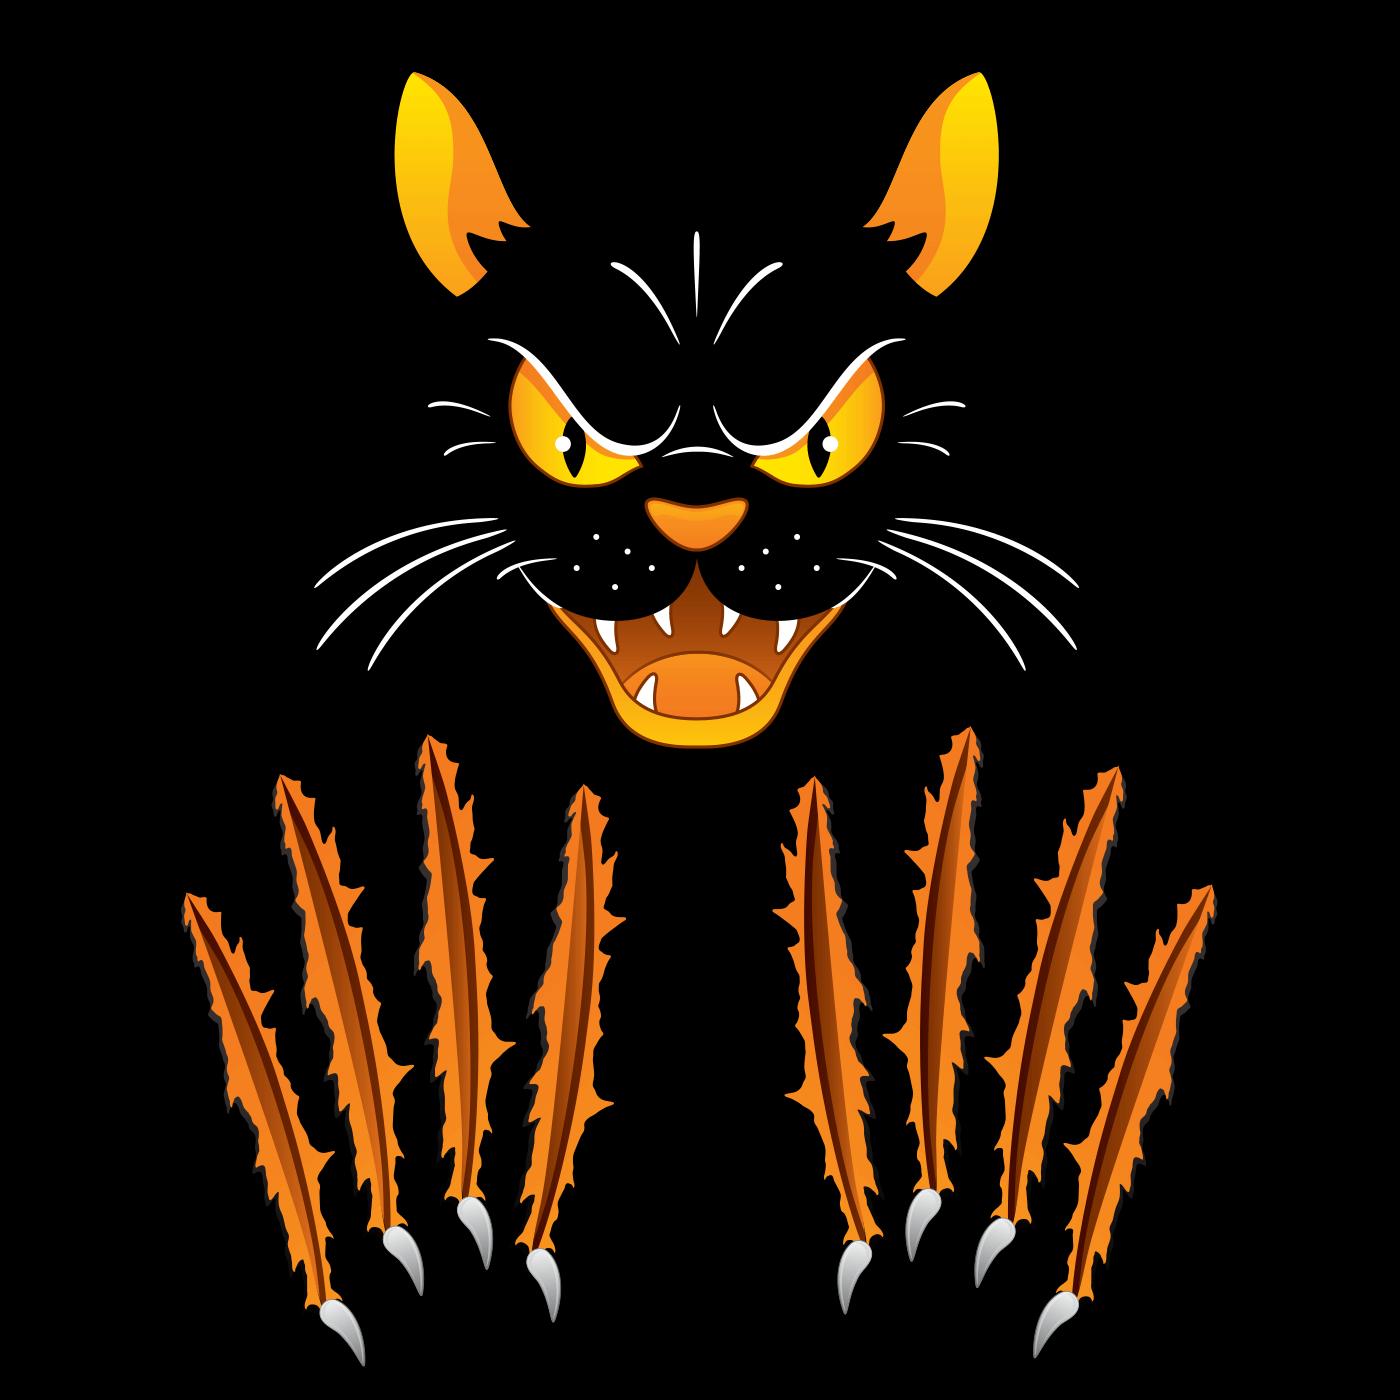 Episode 1: I Saw a Wampus Cat